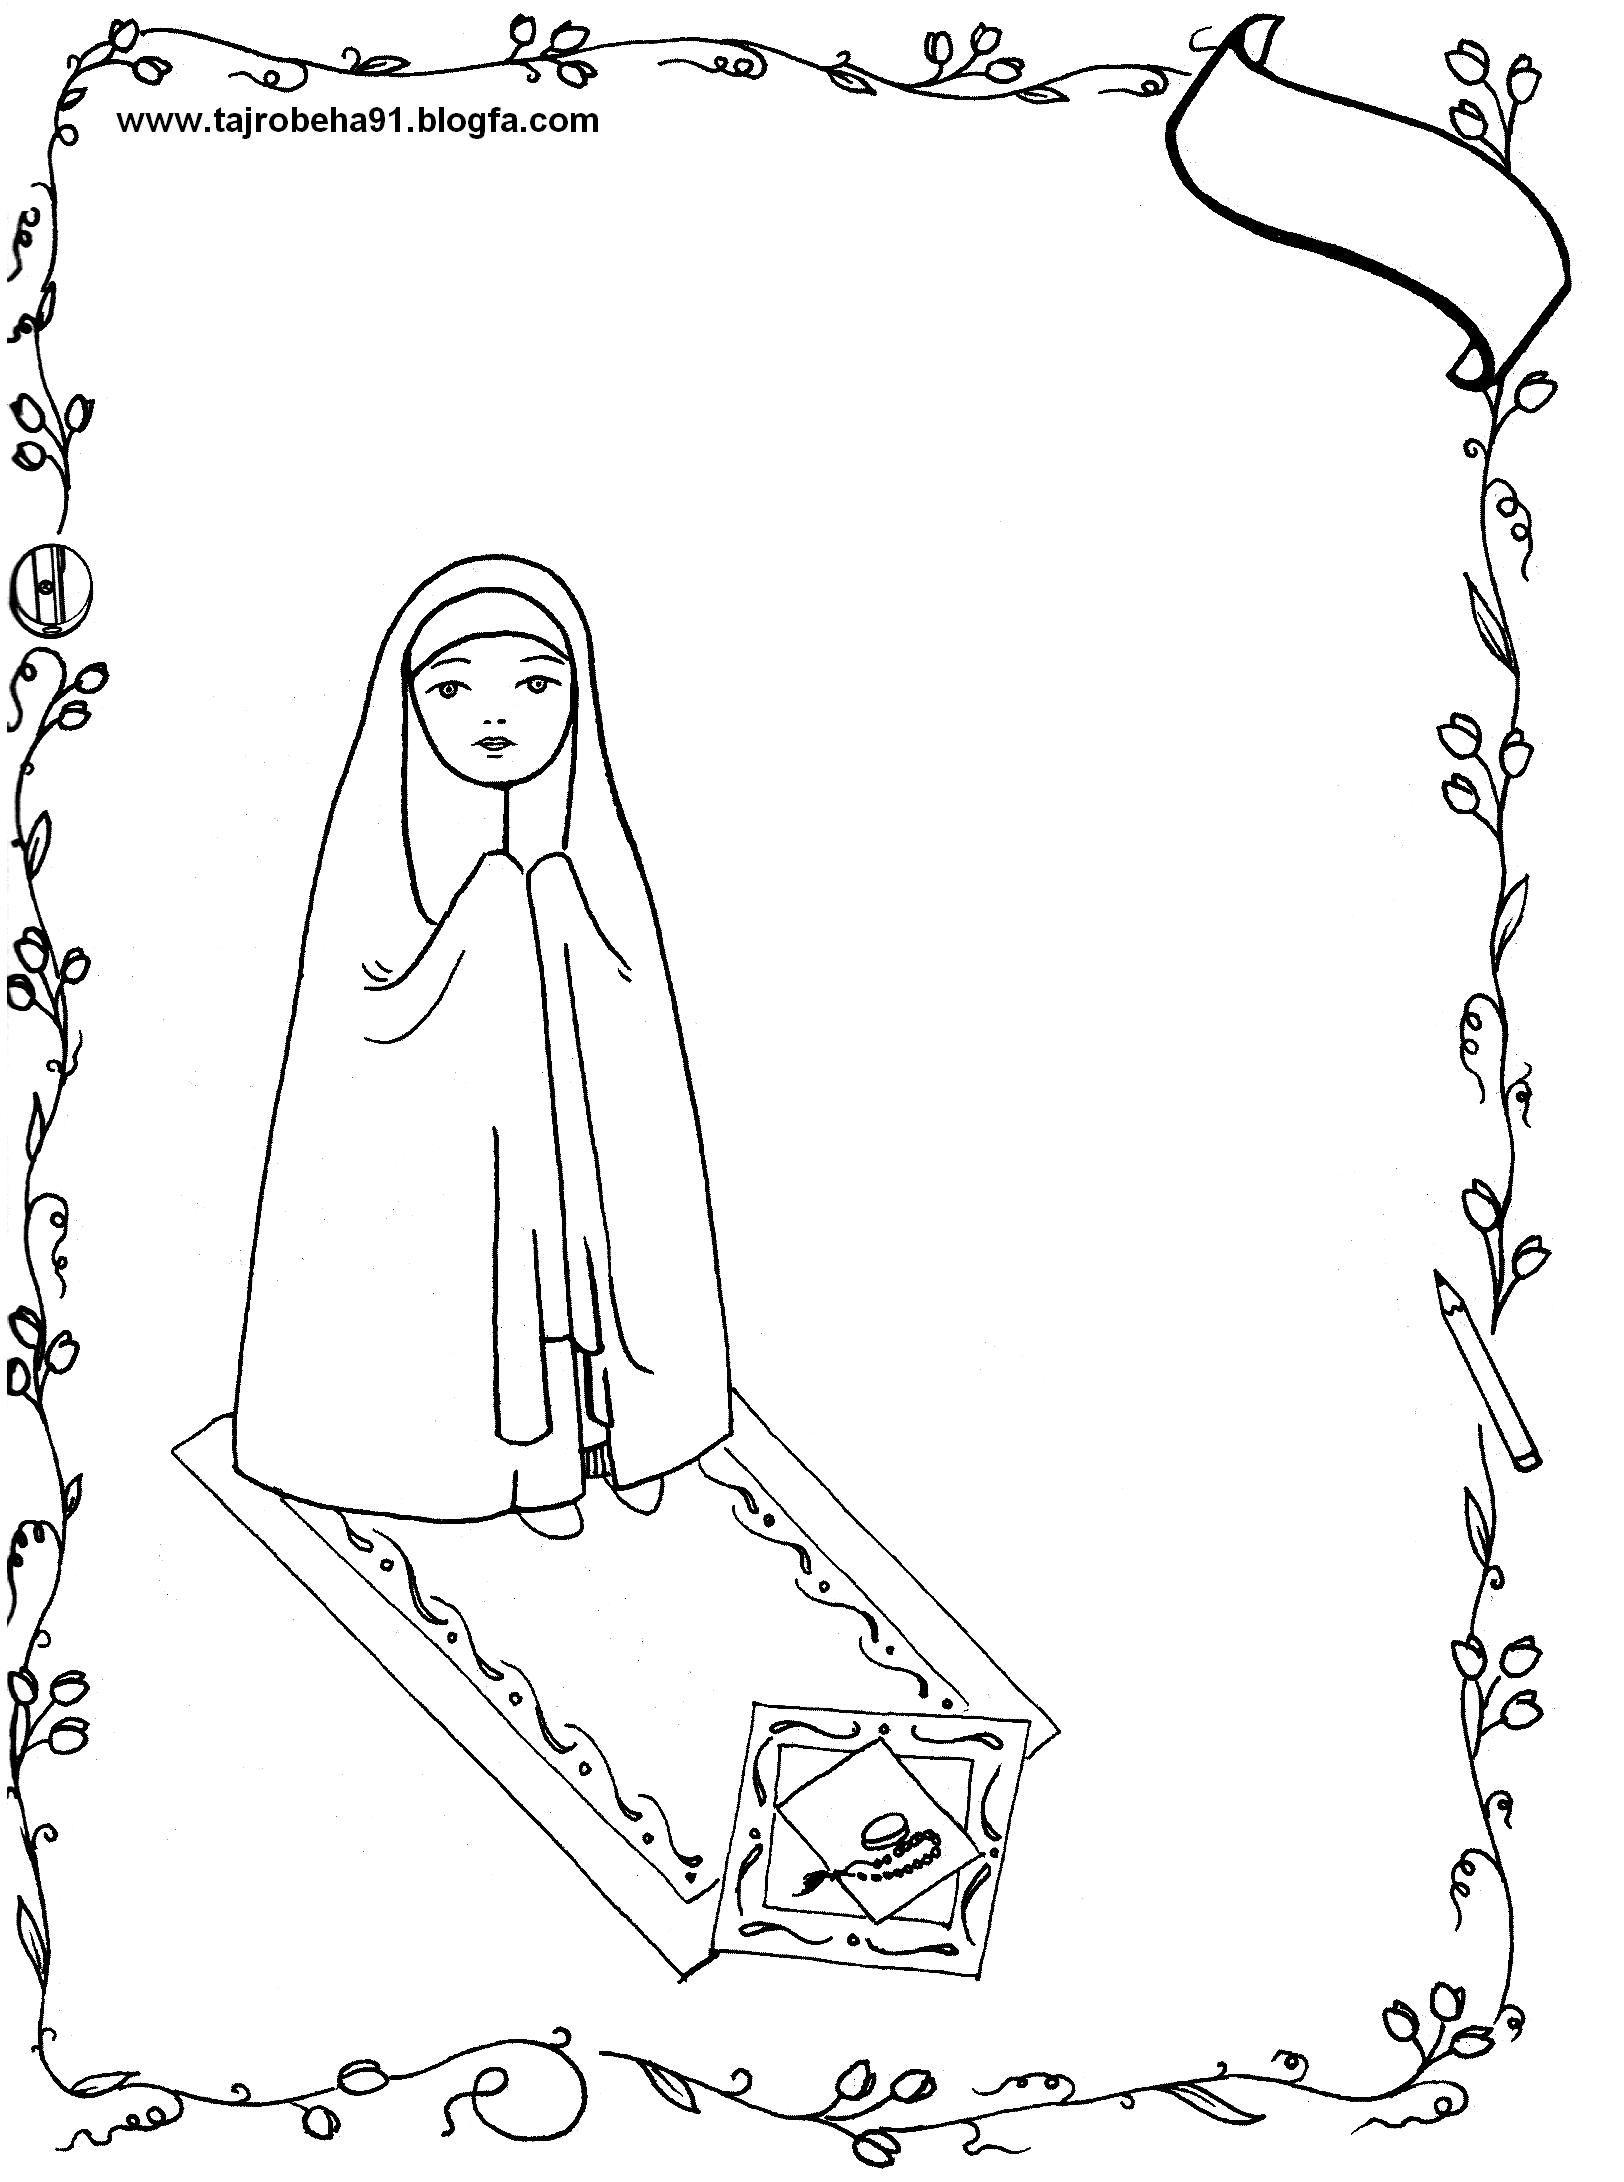 Pin By Fauziyaalishirazi Ali On رسوم لأطفال القران Quran For Kids Islamic Kids Activities Mosque Art Clip Art Borders